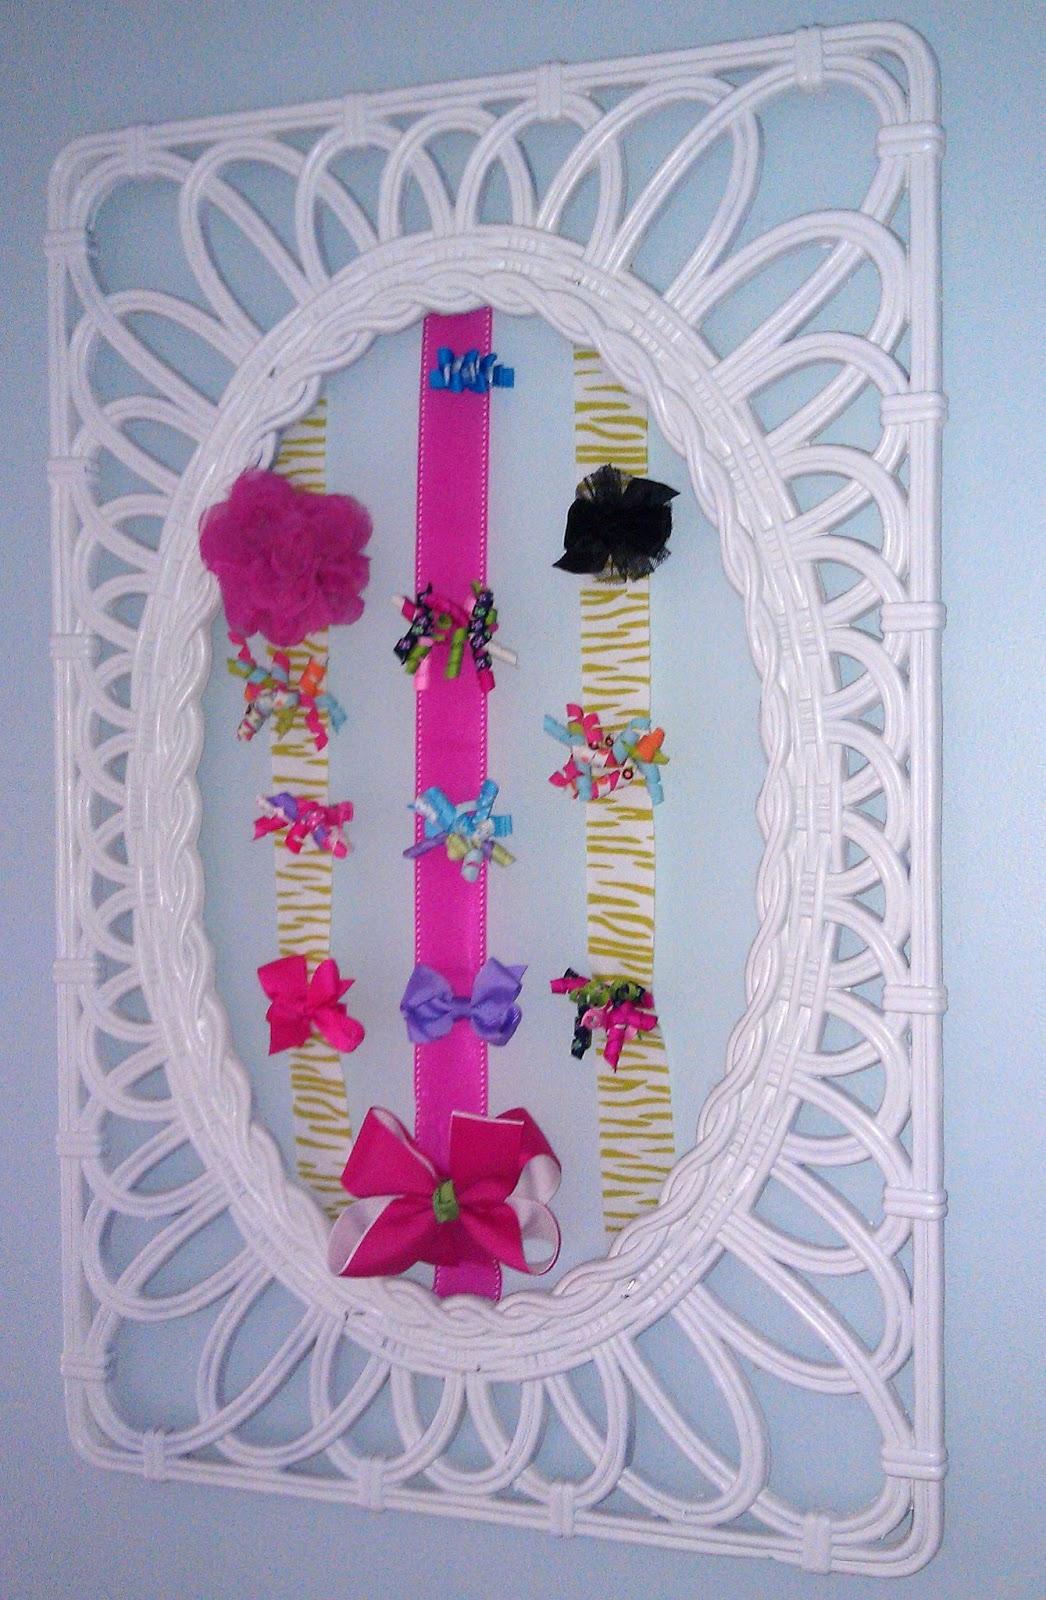 How to organize hair bows - Organizing Hair Accessories